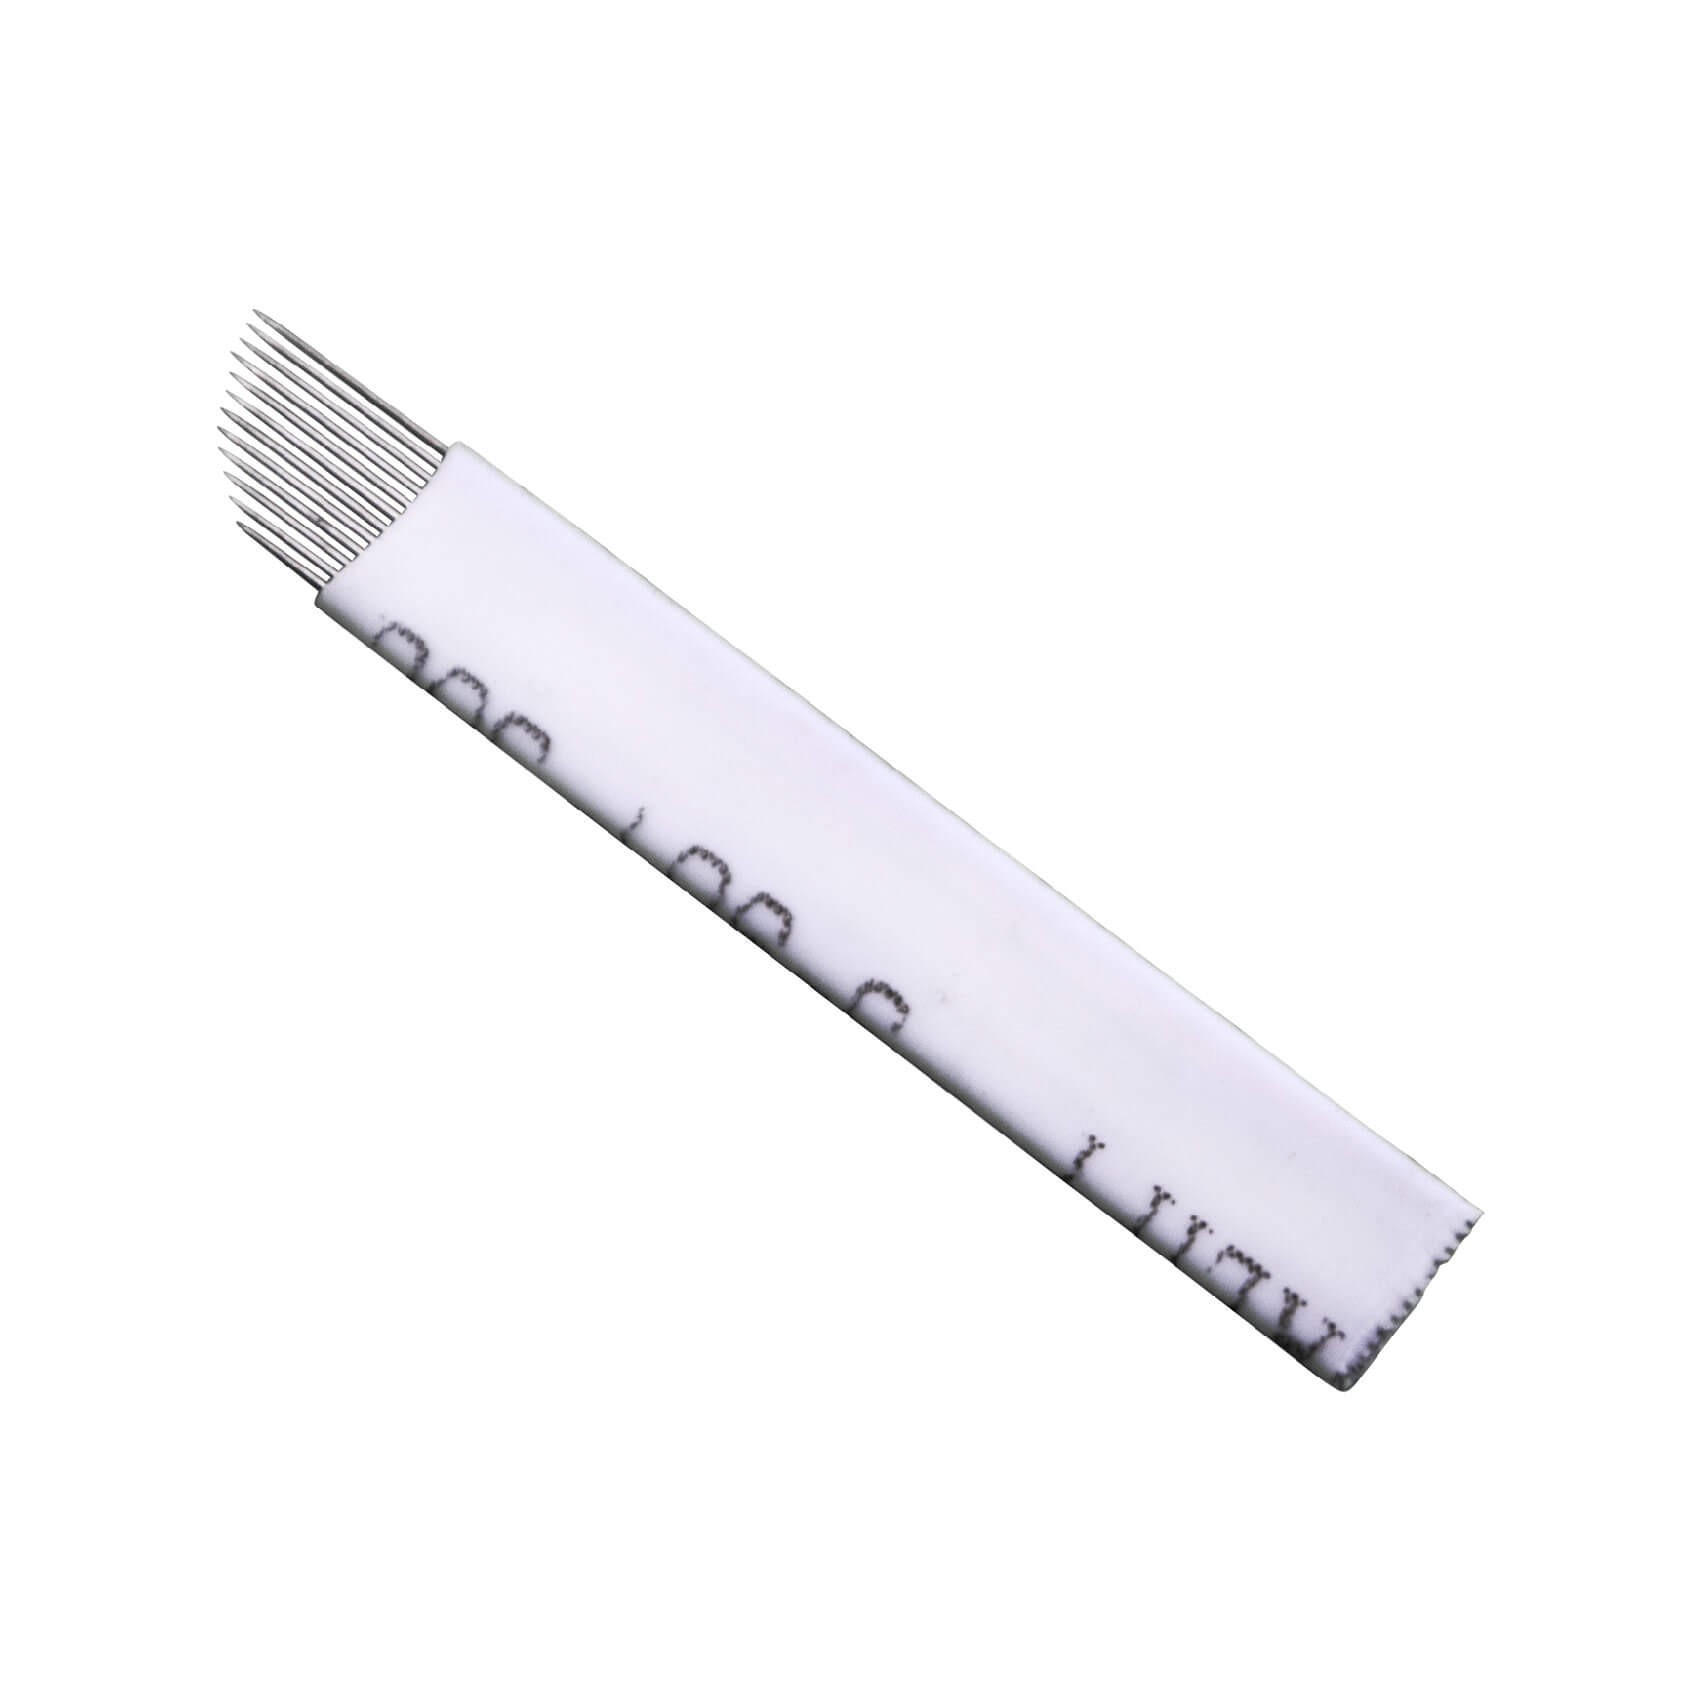 Lâmina Tebori Flex Chanfrada Espessura 0.20mm Kit 5un